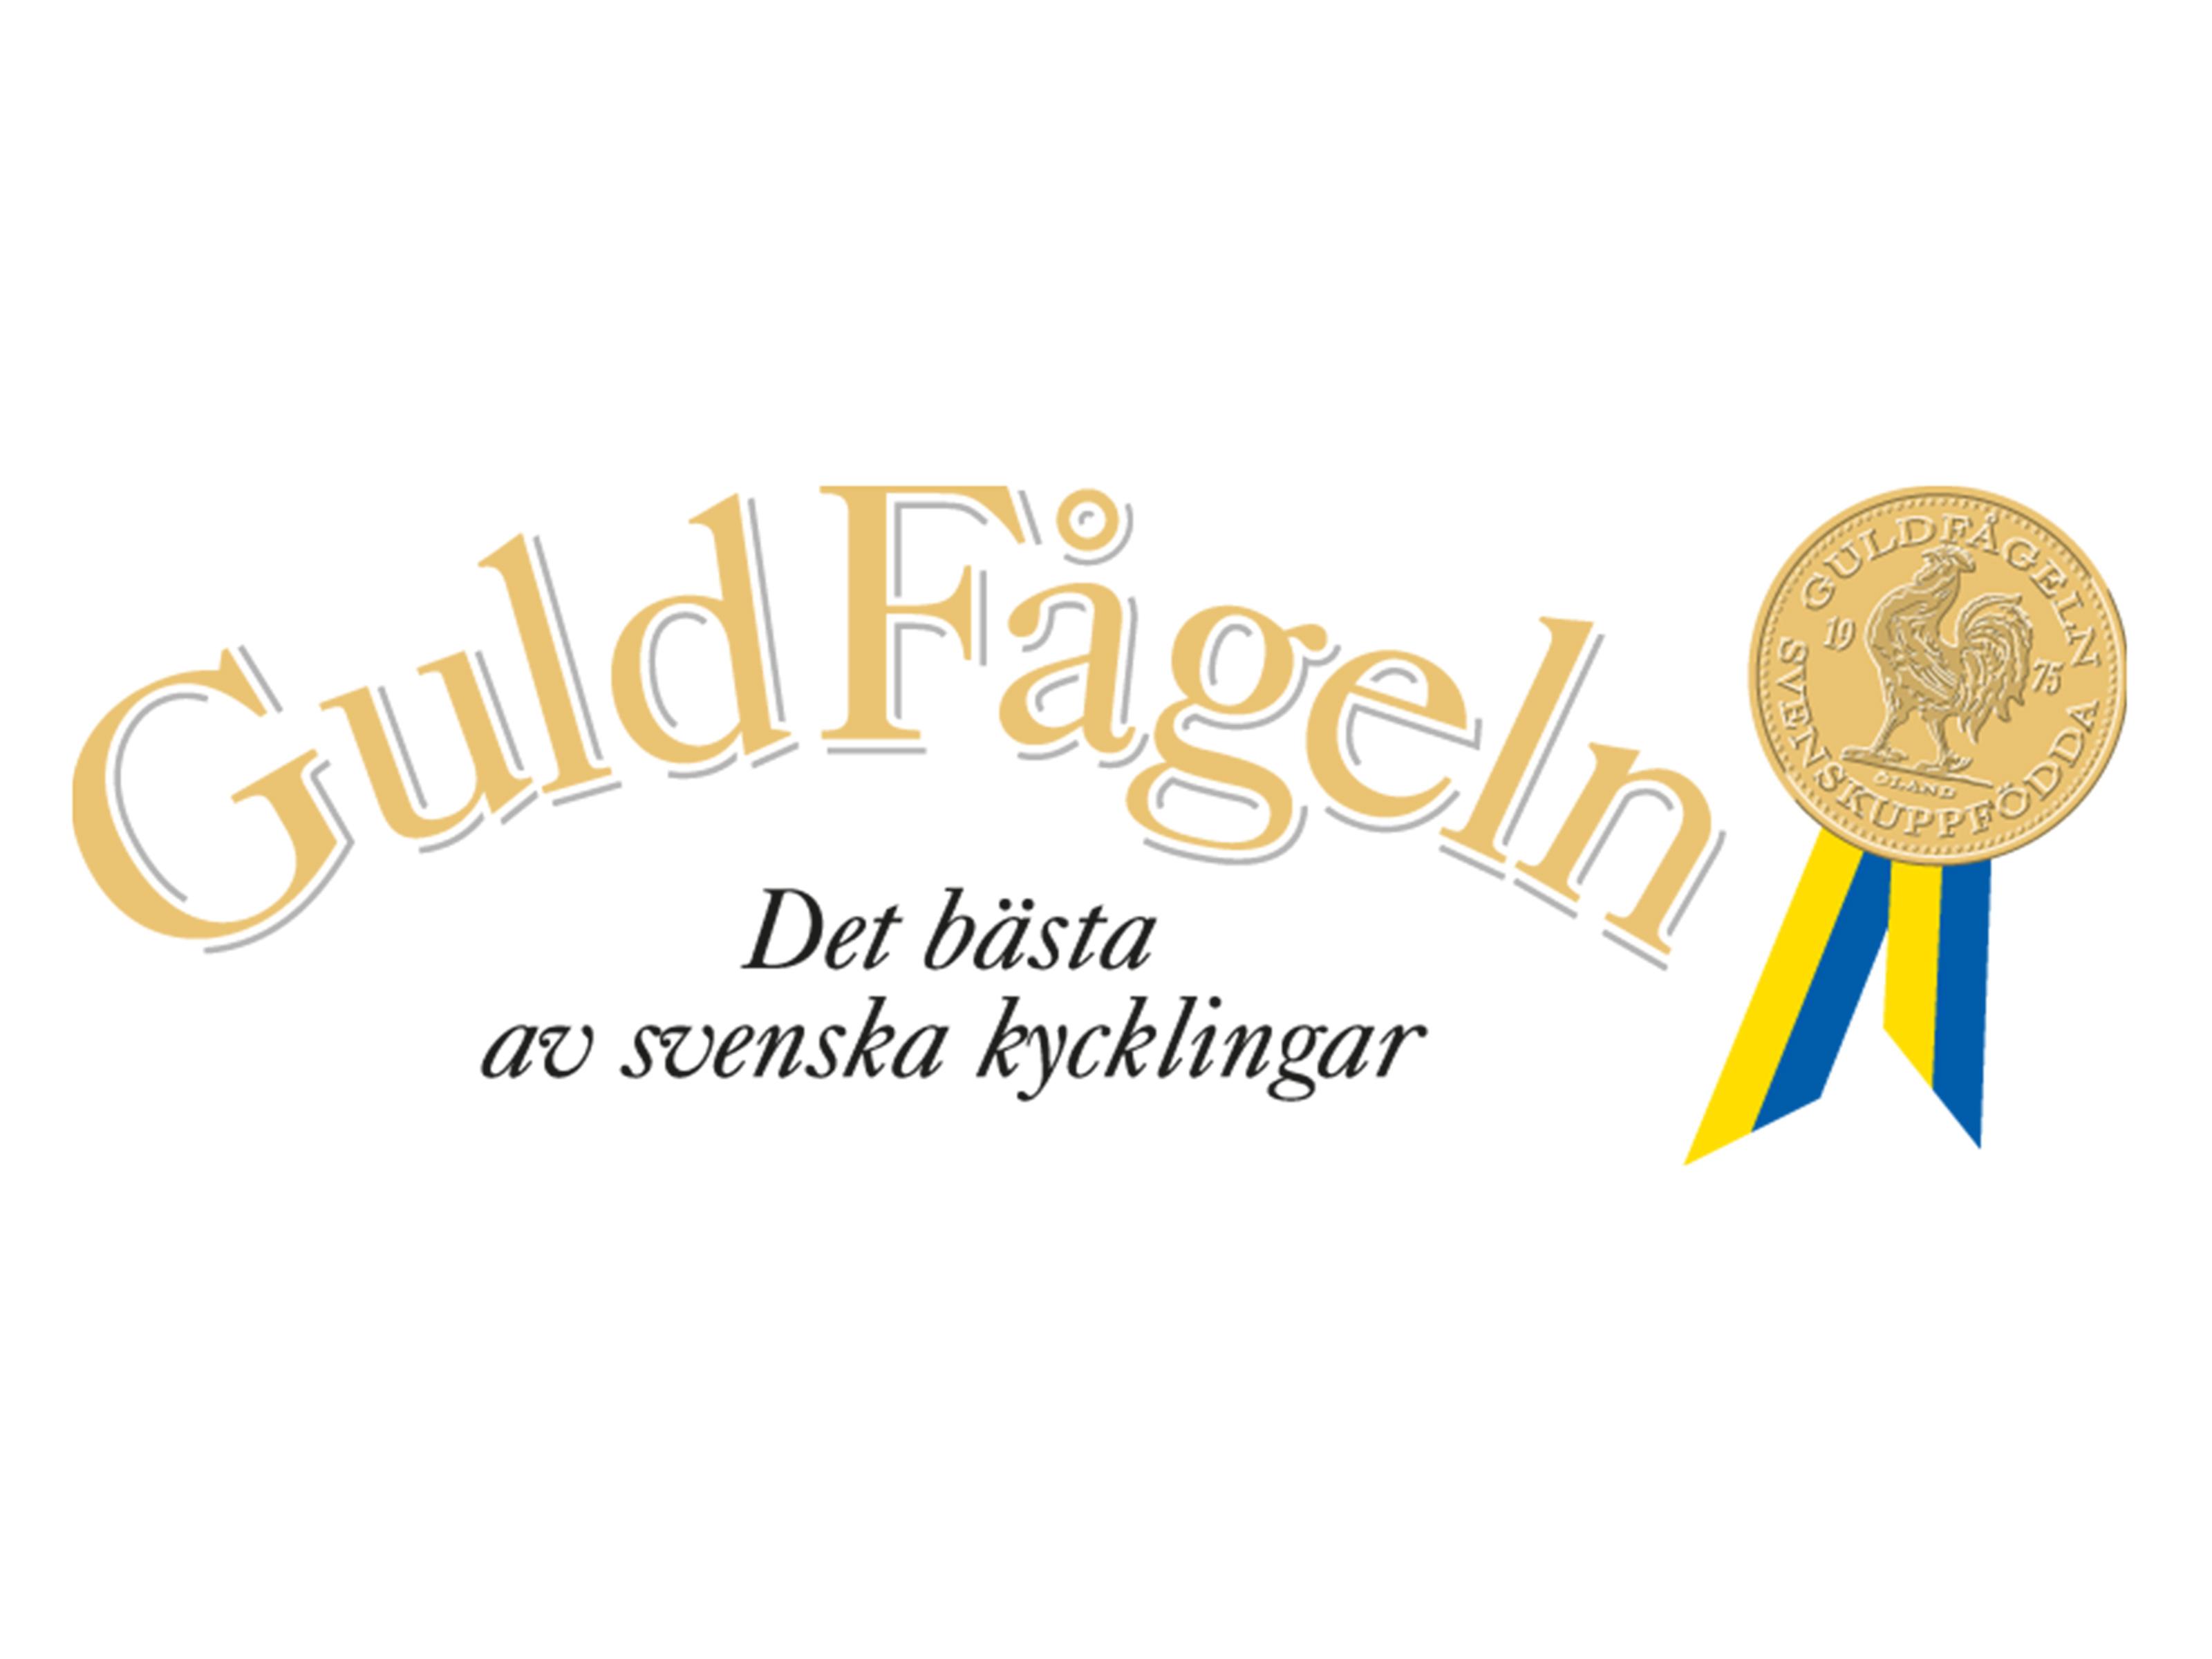 Guldfågel logo